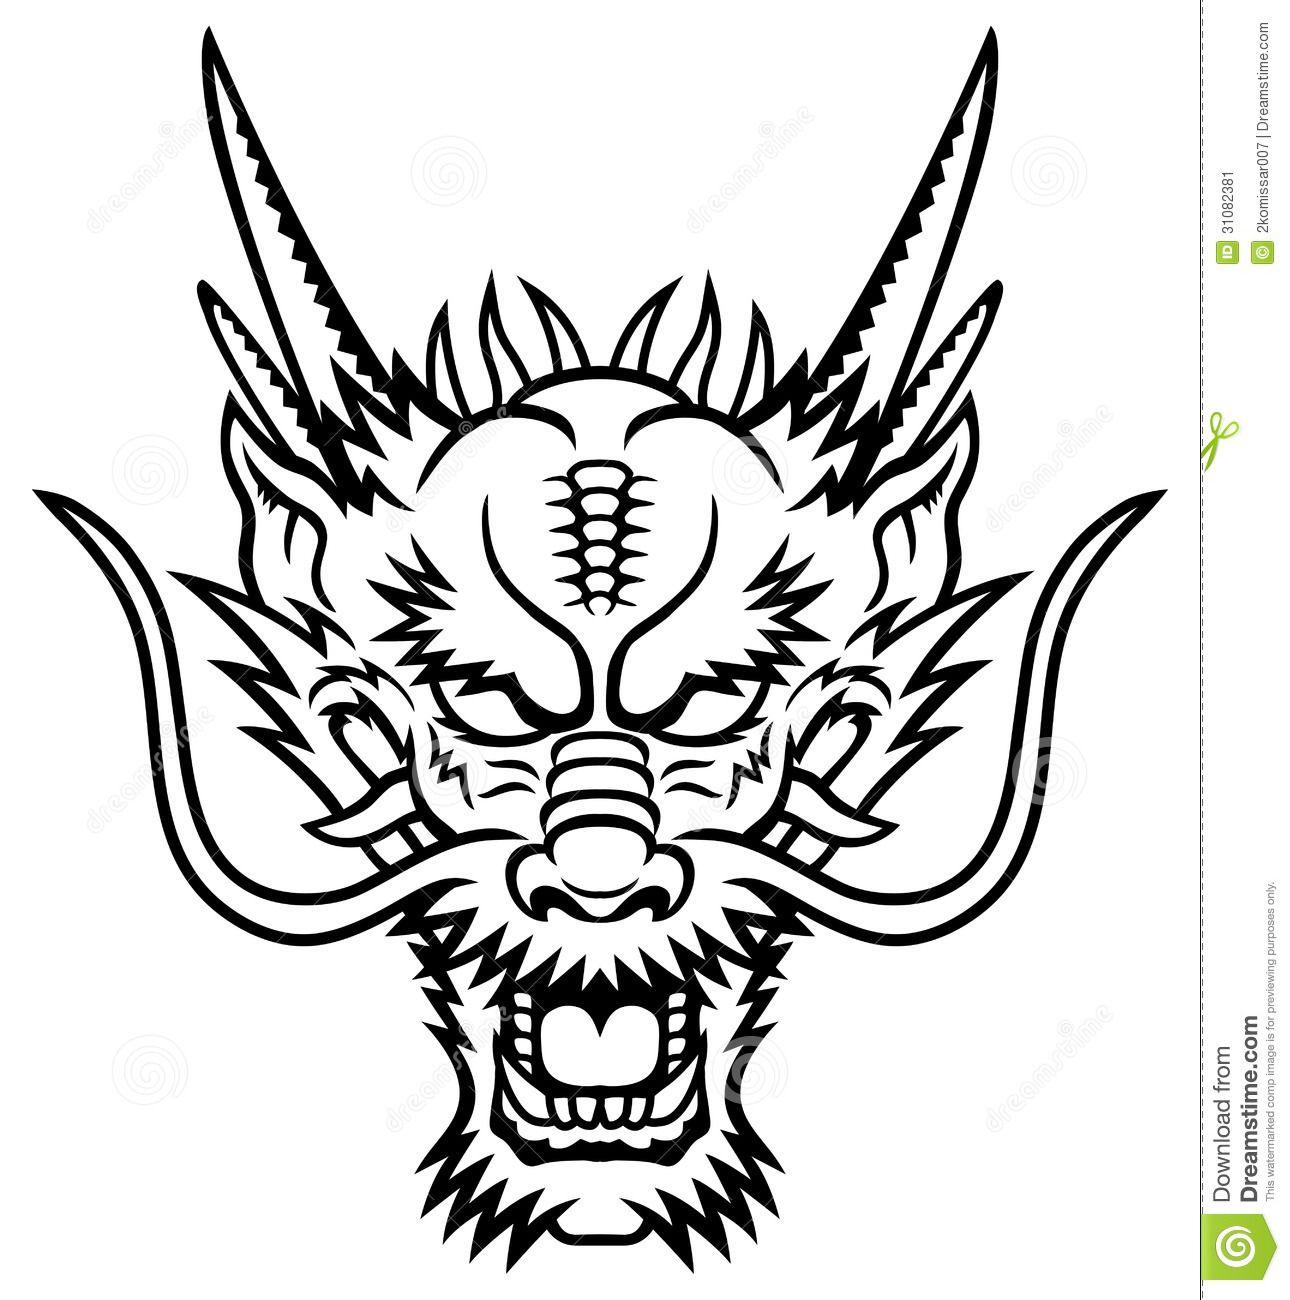 Dragon head stock image image 31082381 idea box pinterest b71abb6dd7678bbd14a1f56be5291747g ccuart Images